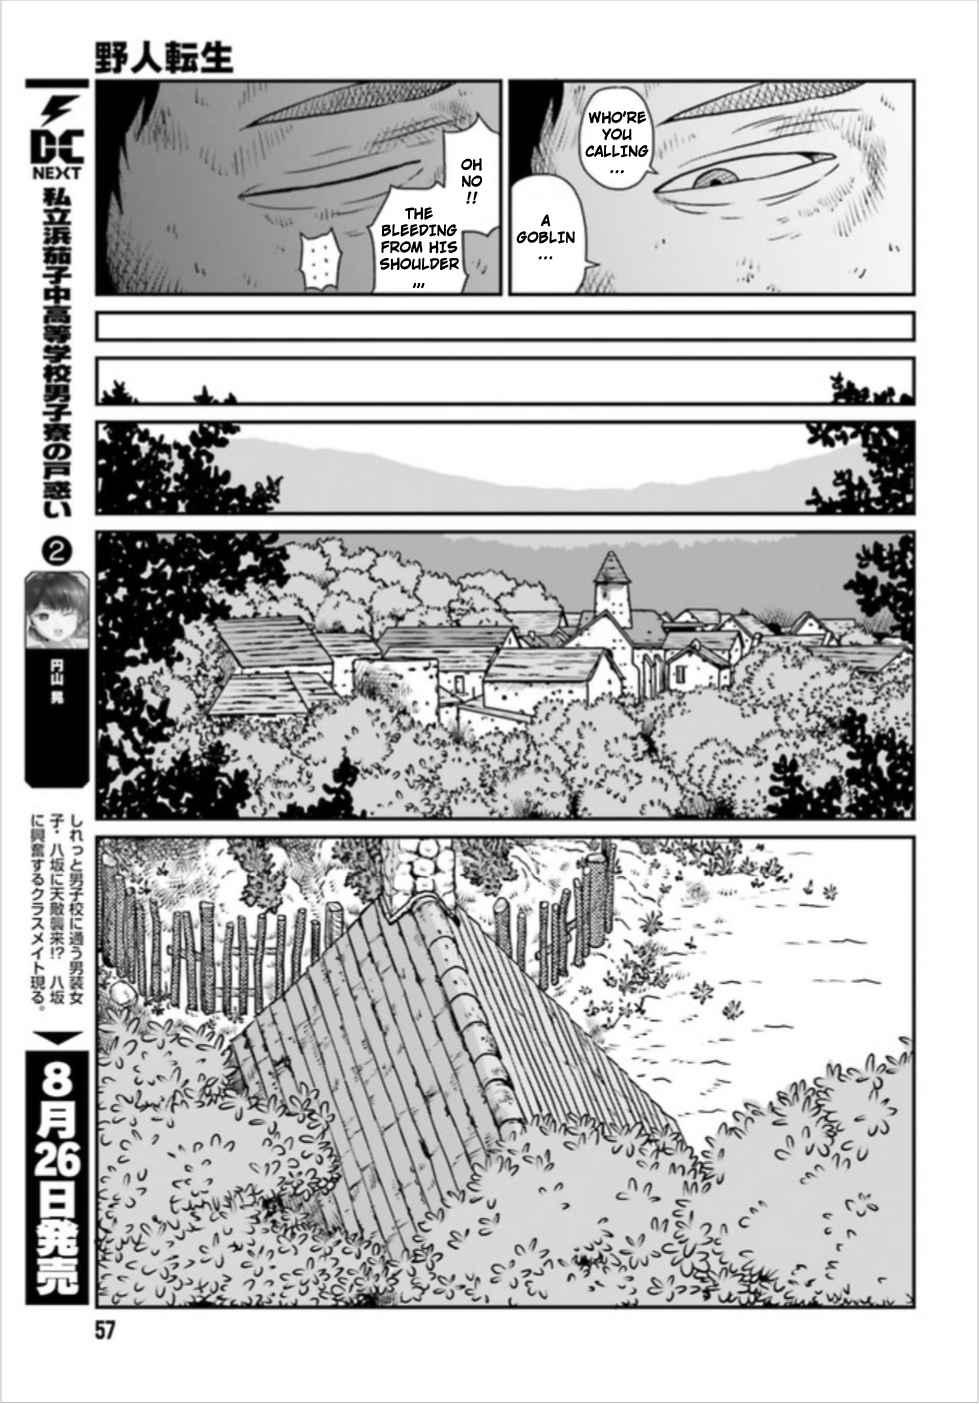 Yajin Tensei: Karate Survivor In Another World - chapter 3.1-eng-li